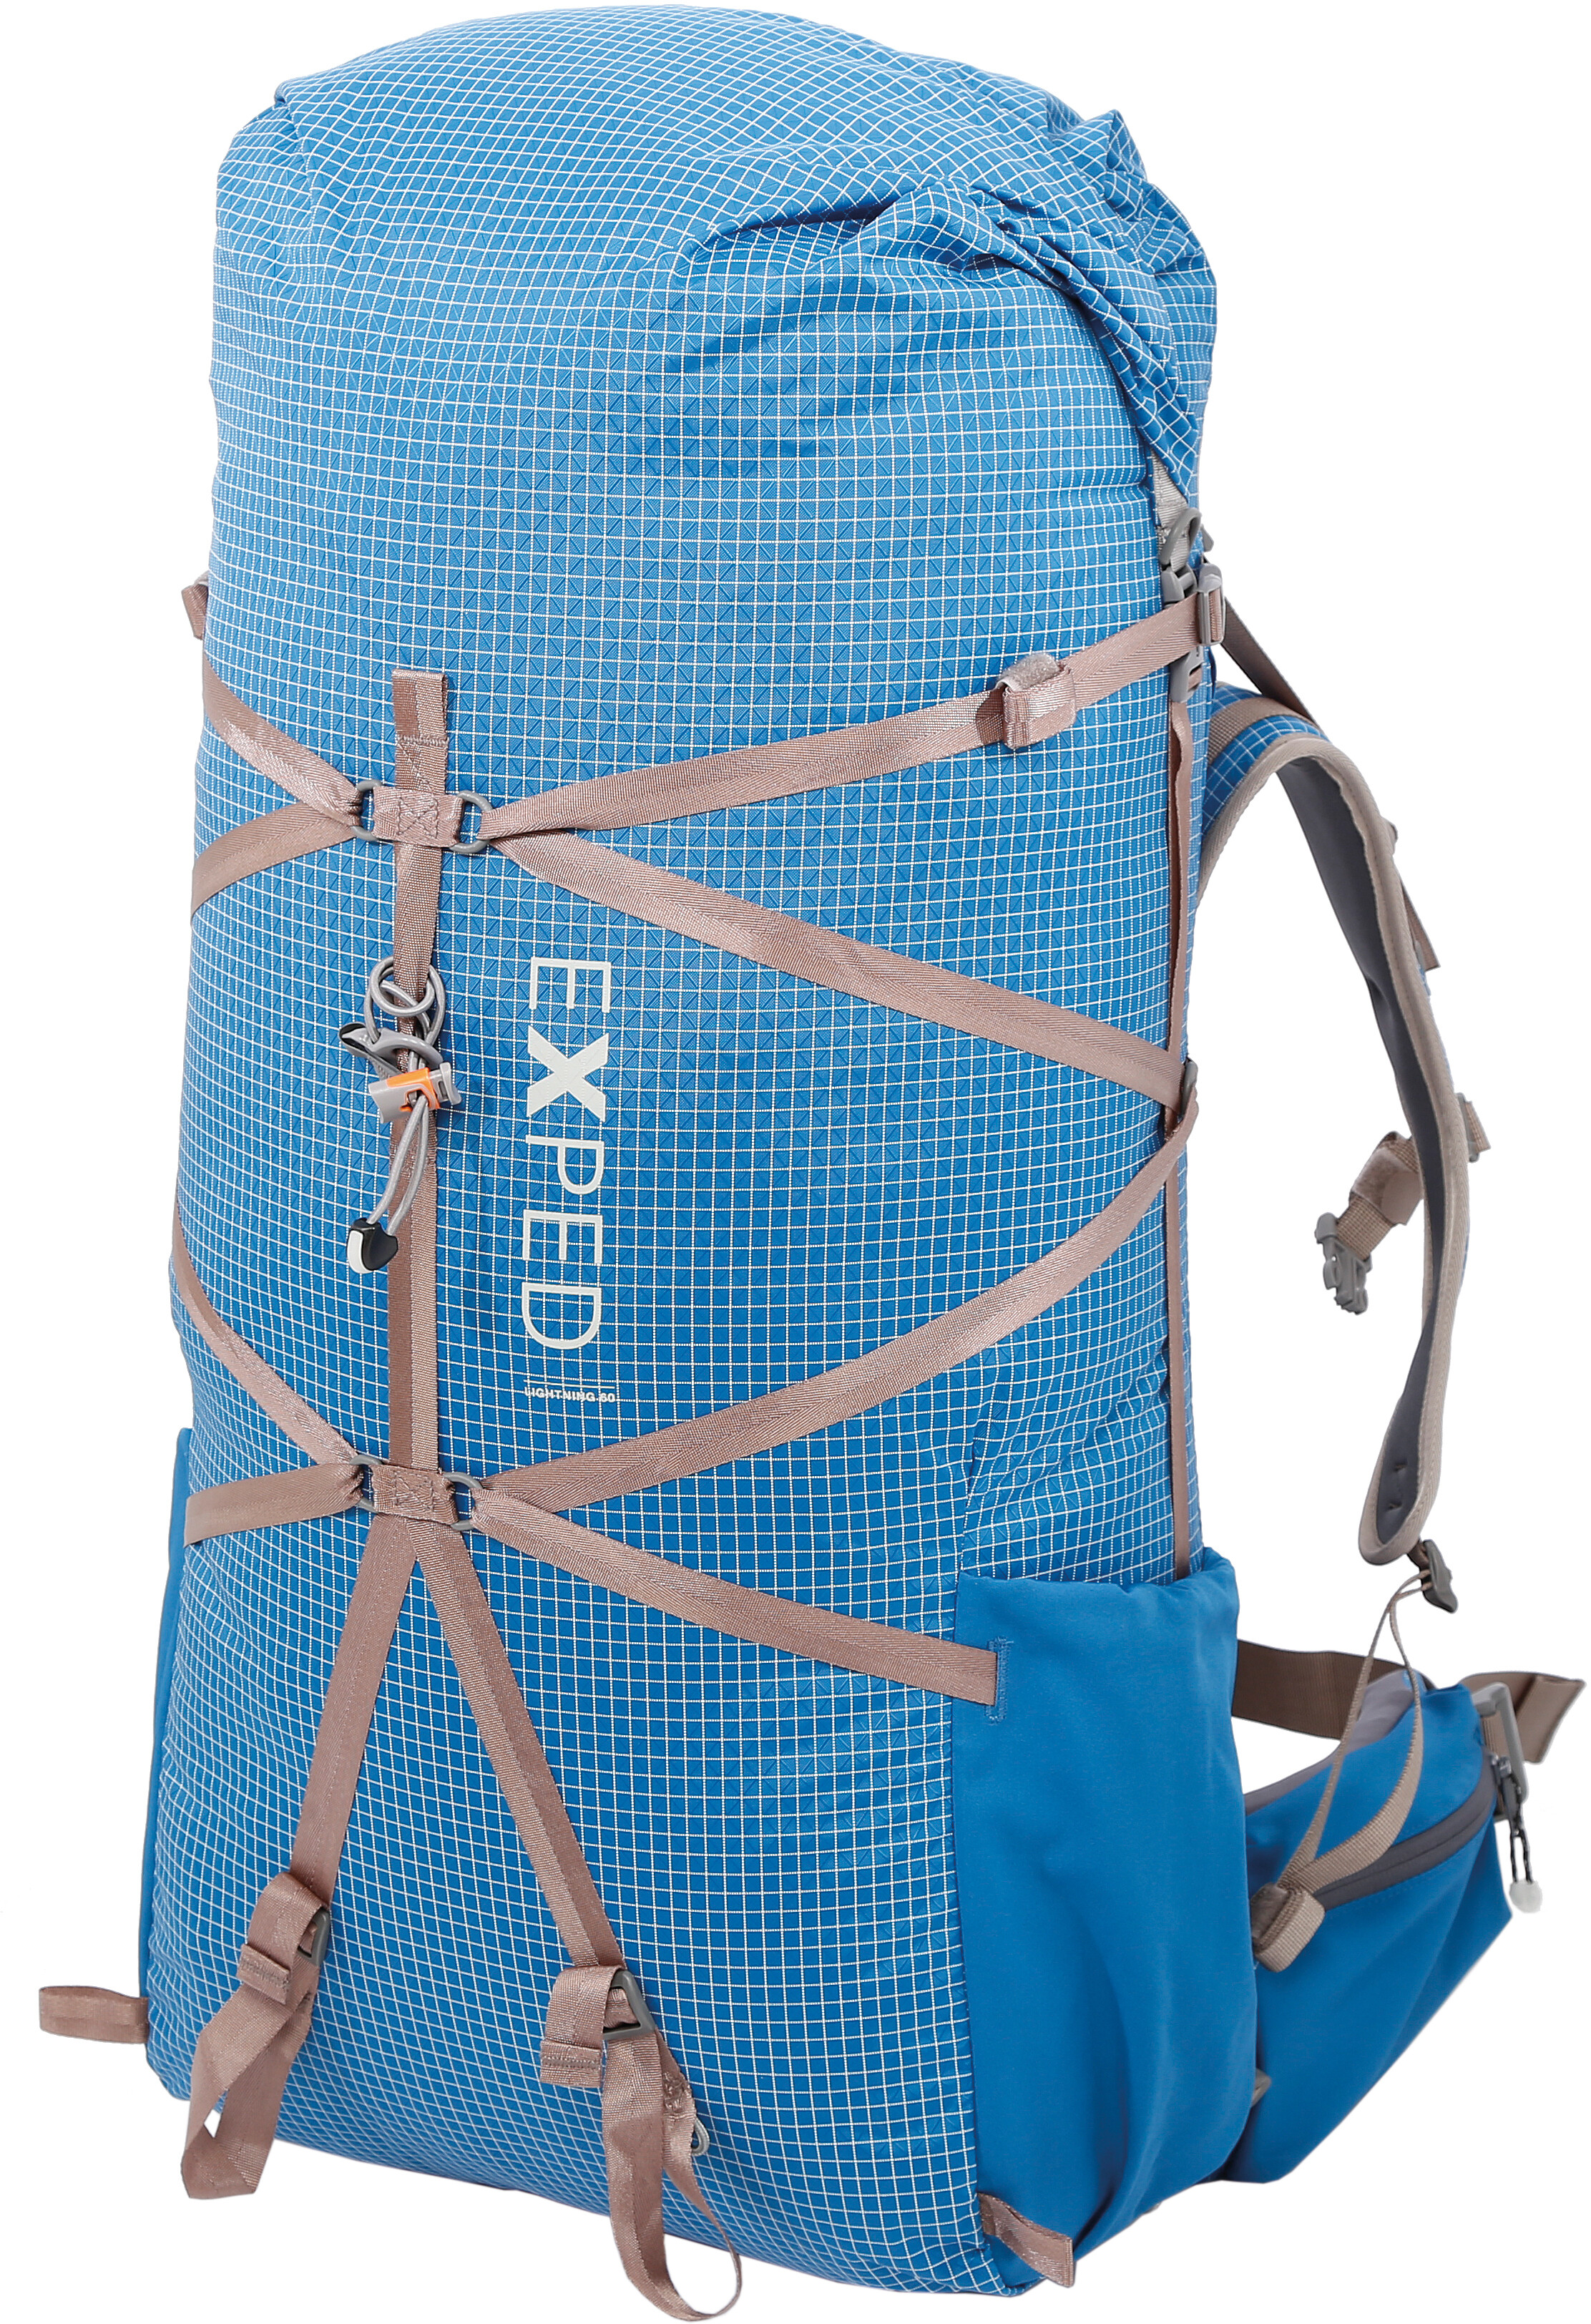 838f13b5732 Exped Lightning 60 Trekking Backpack deep sea blue - addnature.com